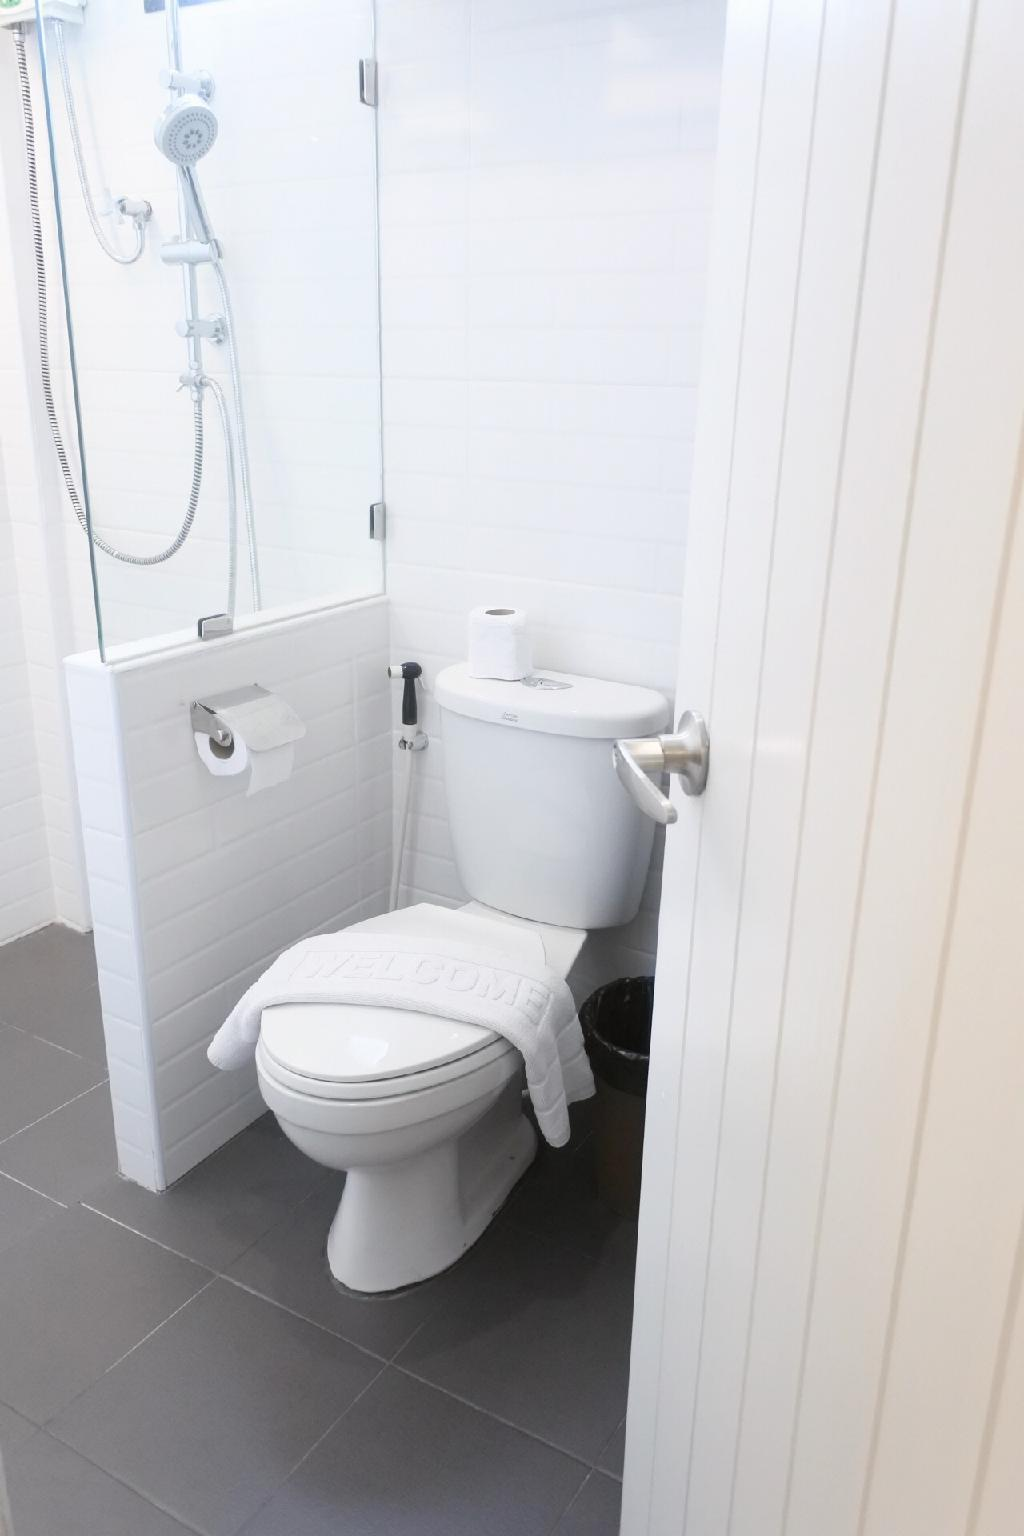 The Nimman Apartment NQ5 อพาร์ตเมนต์ 1 ห้องนอน 1 ห้องน้ำส่วนตัว ขนาด 22 ตร.ม. – นิมมานเหมินทร์